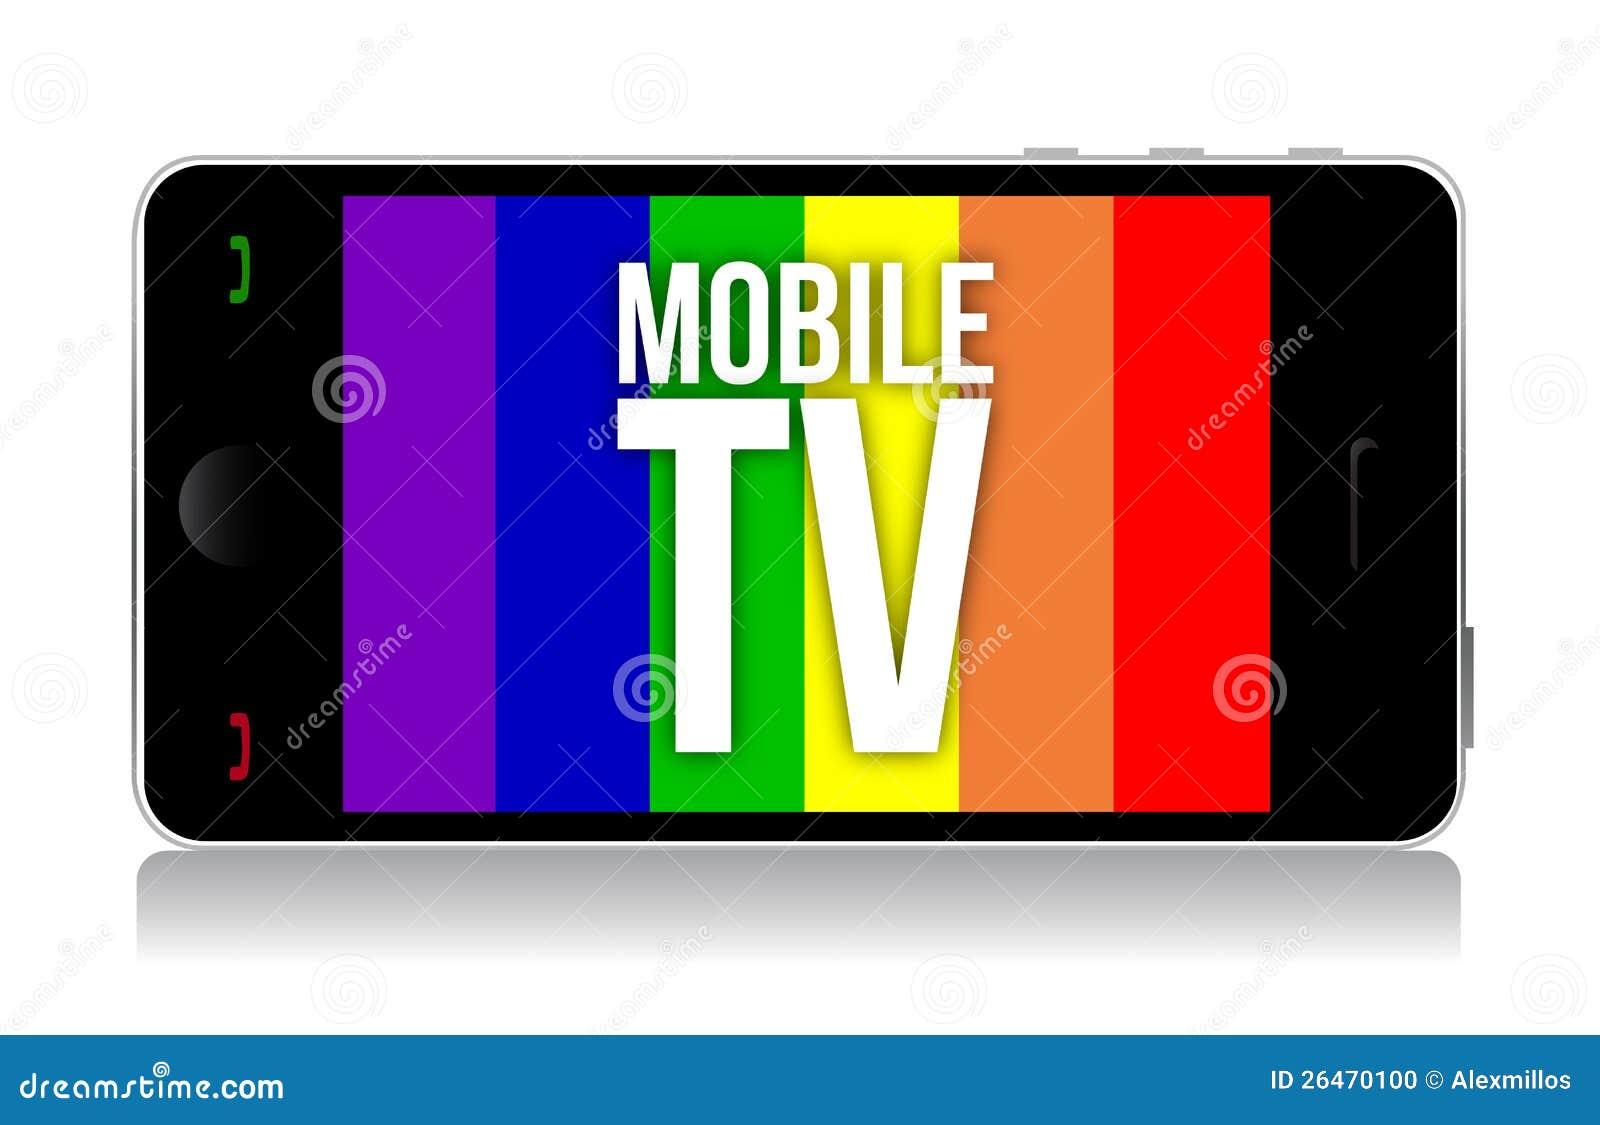 Mobile tv illustration design stock photo image 26470100 for Mobile tv dwg